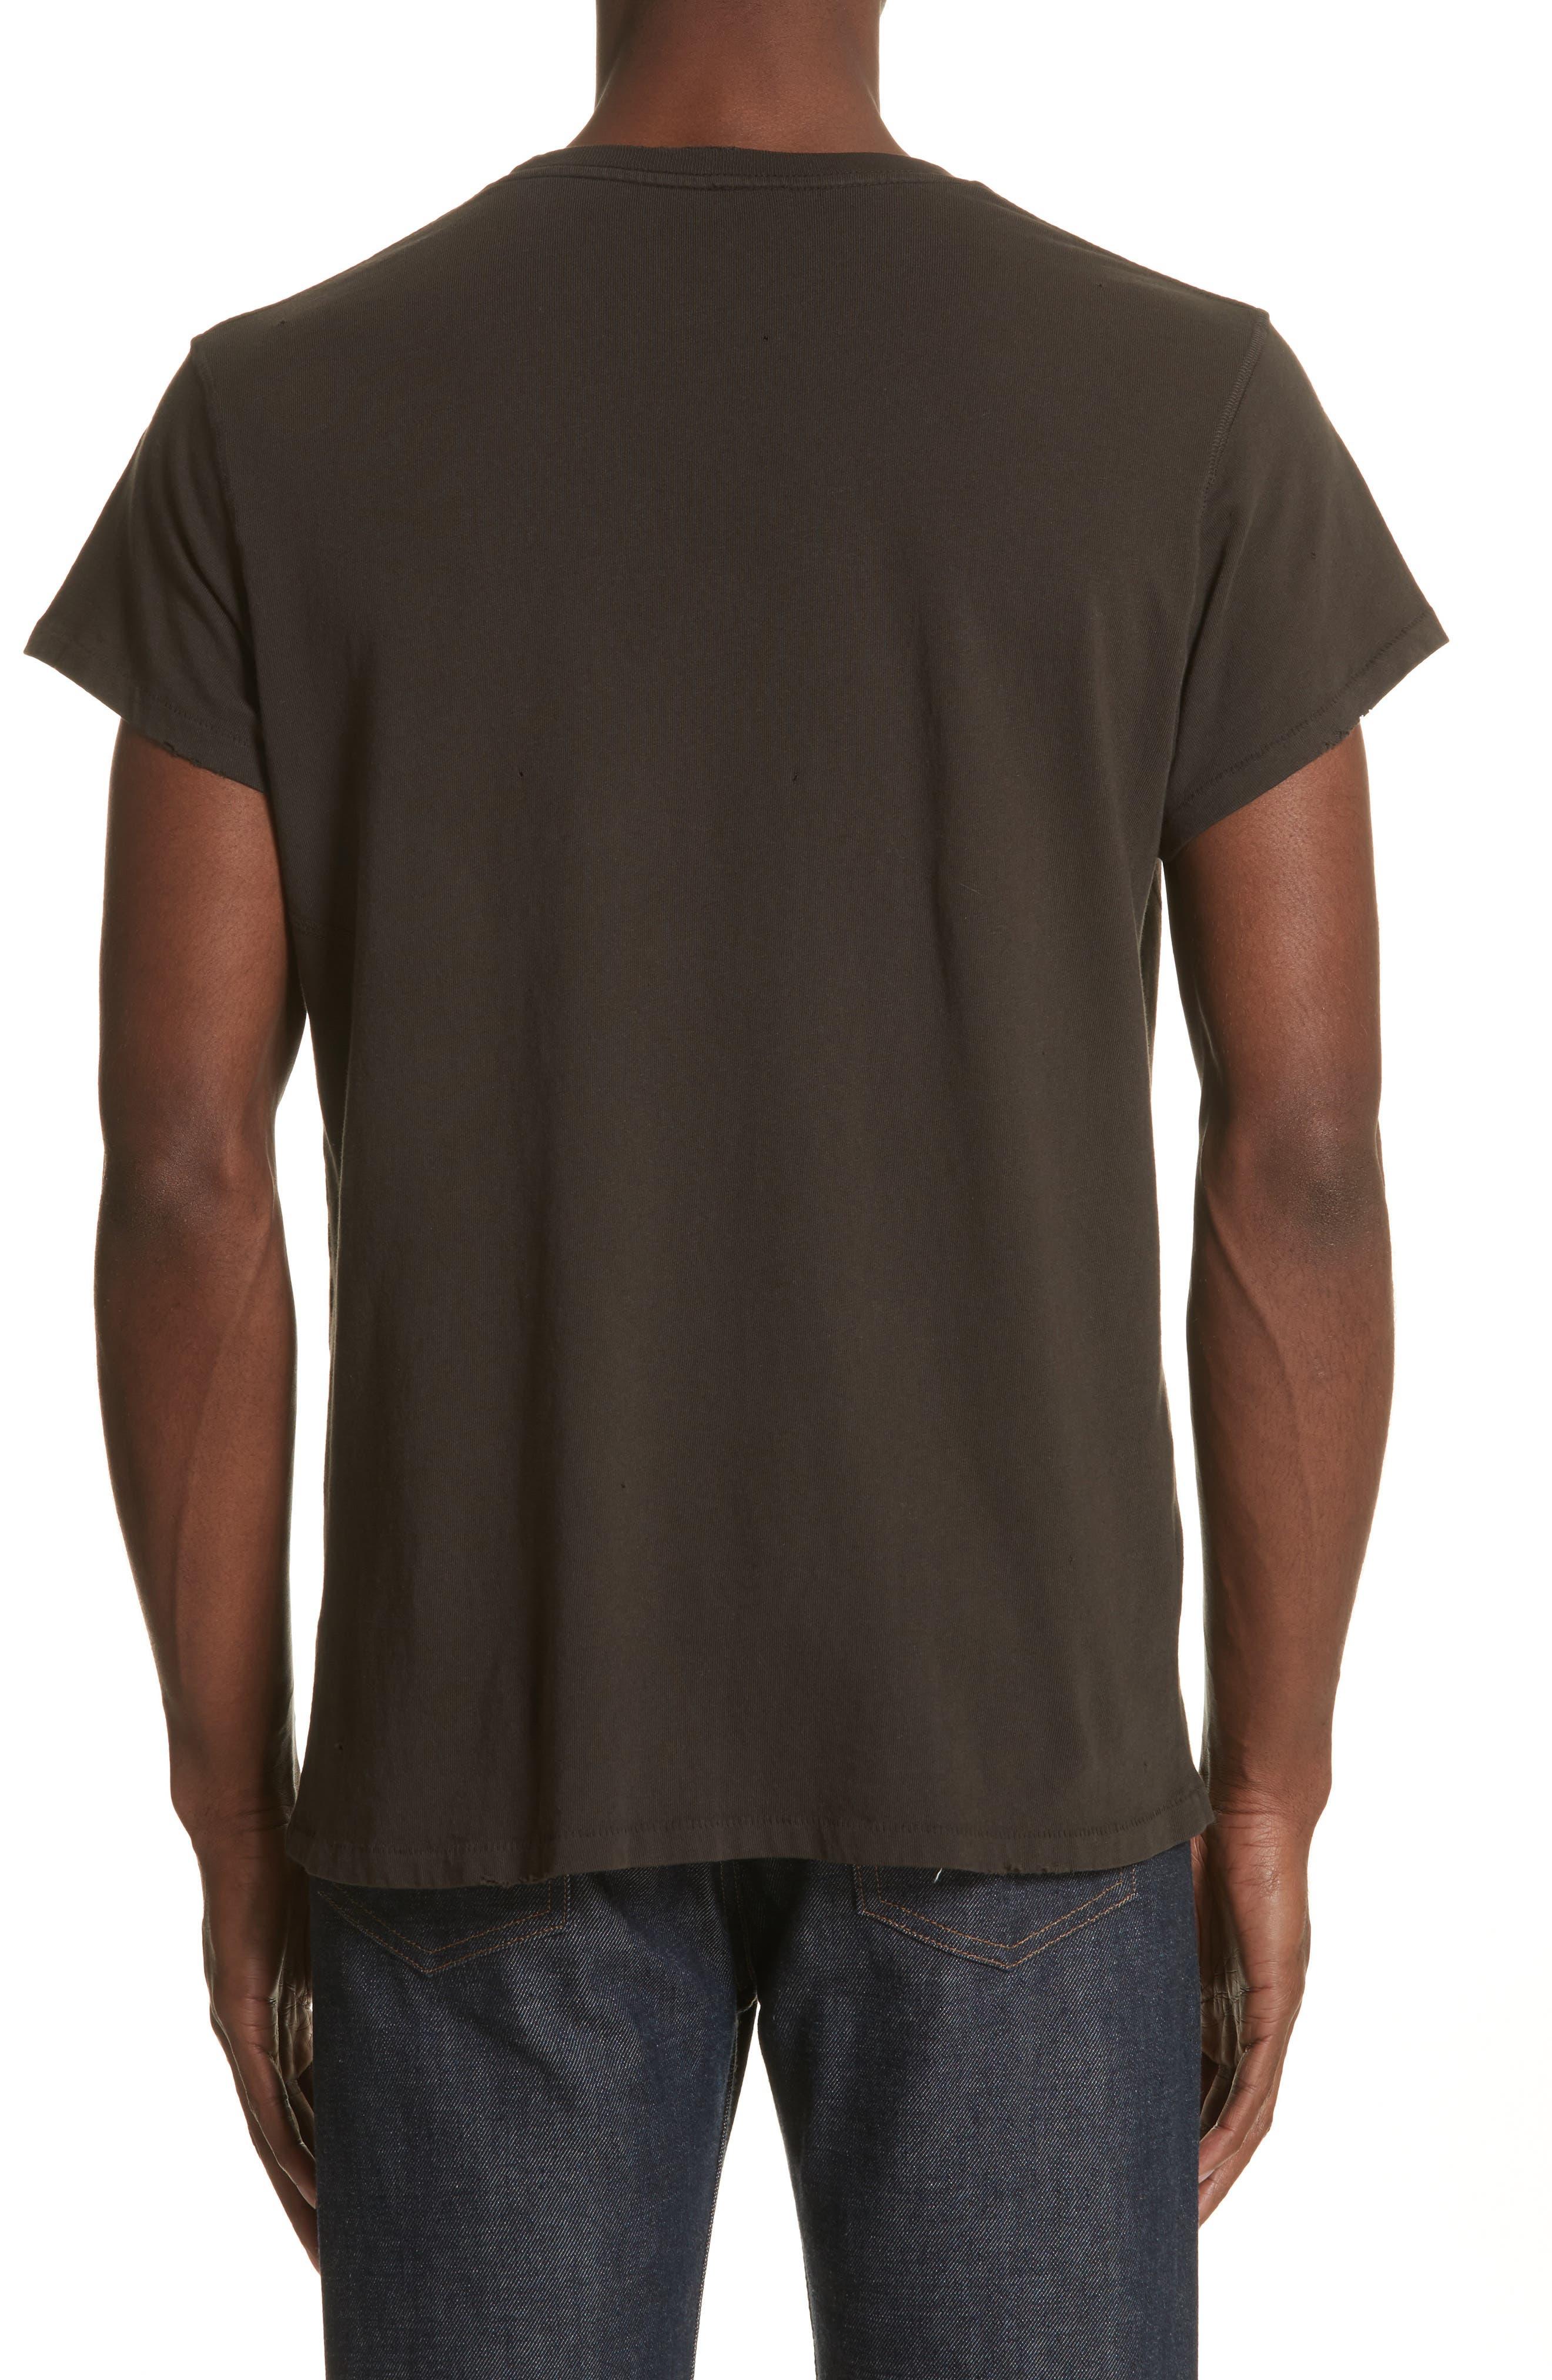 KISS Graphic T-Shirt,                             Alternate thumbnail 2, color,                             001